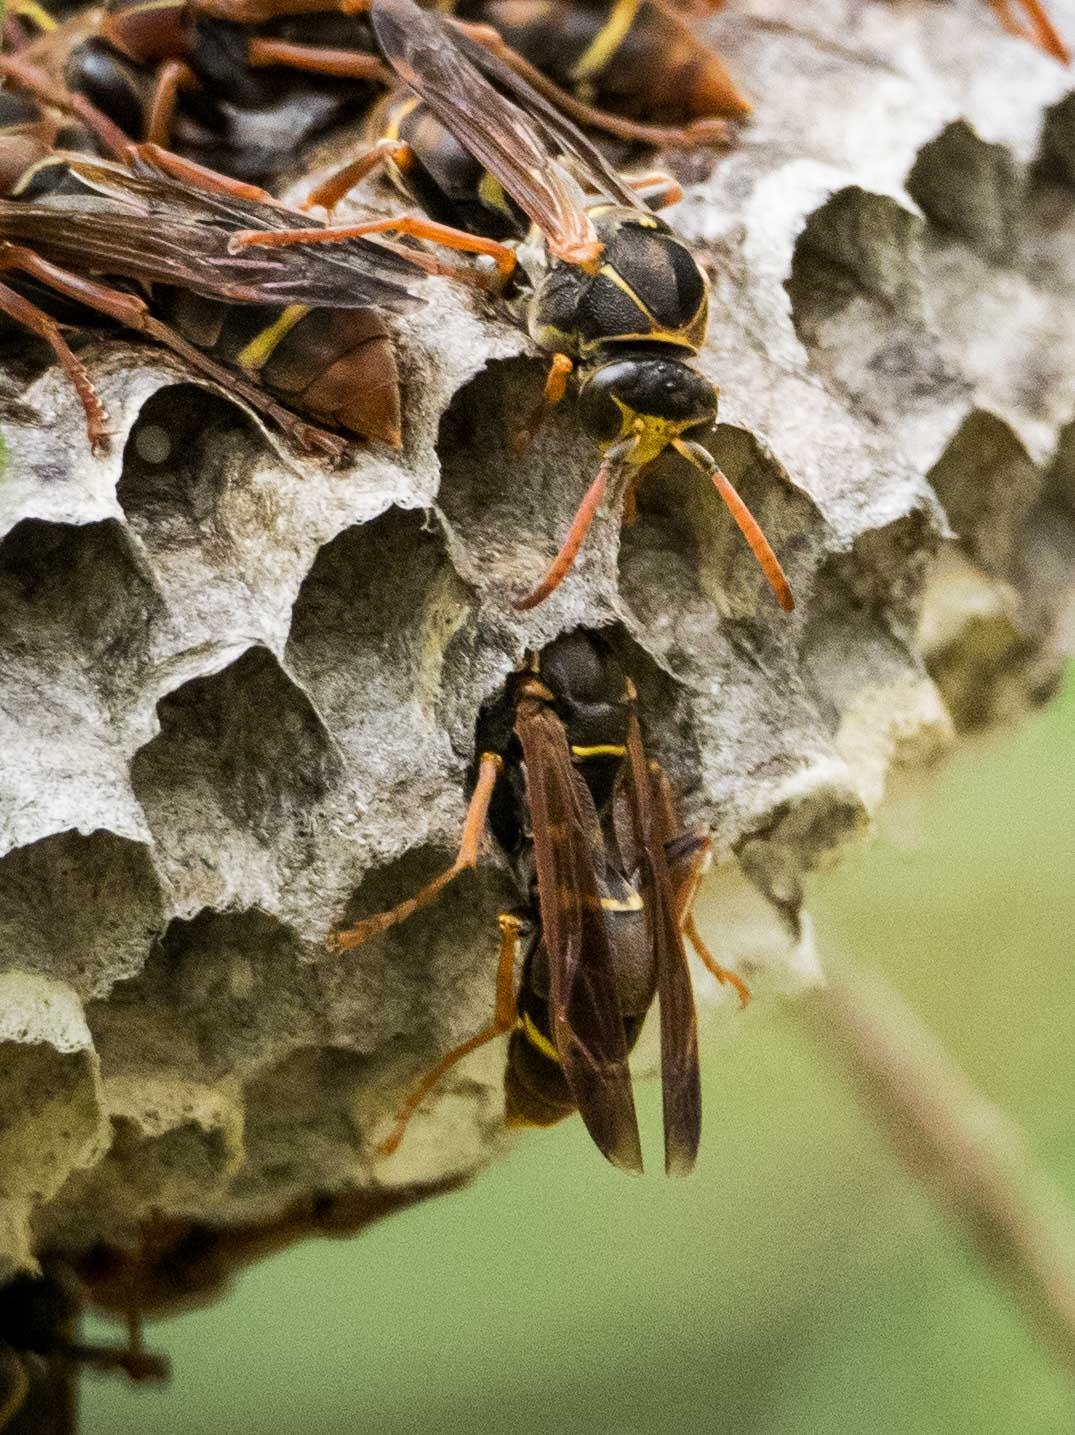 Worker wasps regurgitate caterpillar mush to each growing larva. ( Polistes humilis  Family: Vespidae; subfamily: Polistinae)